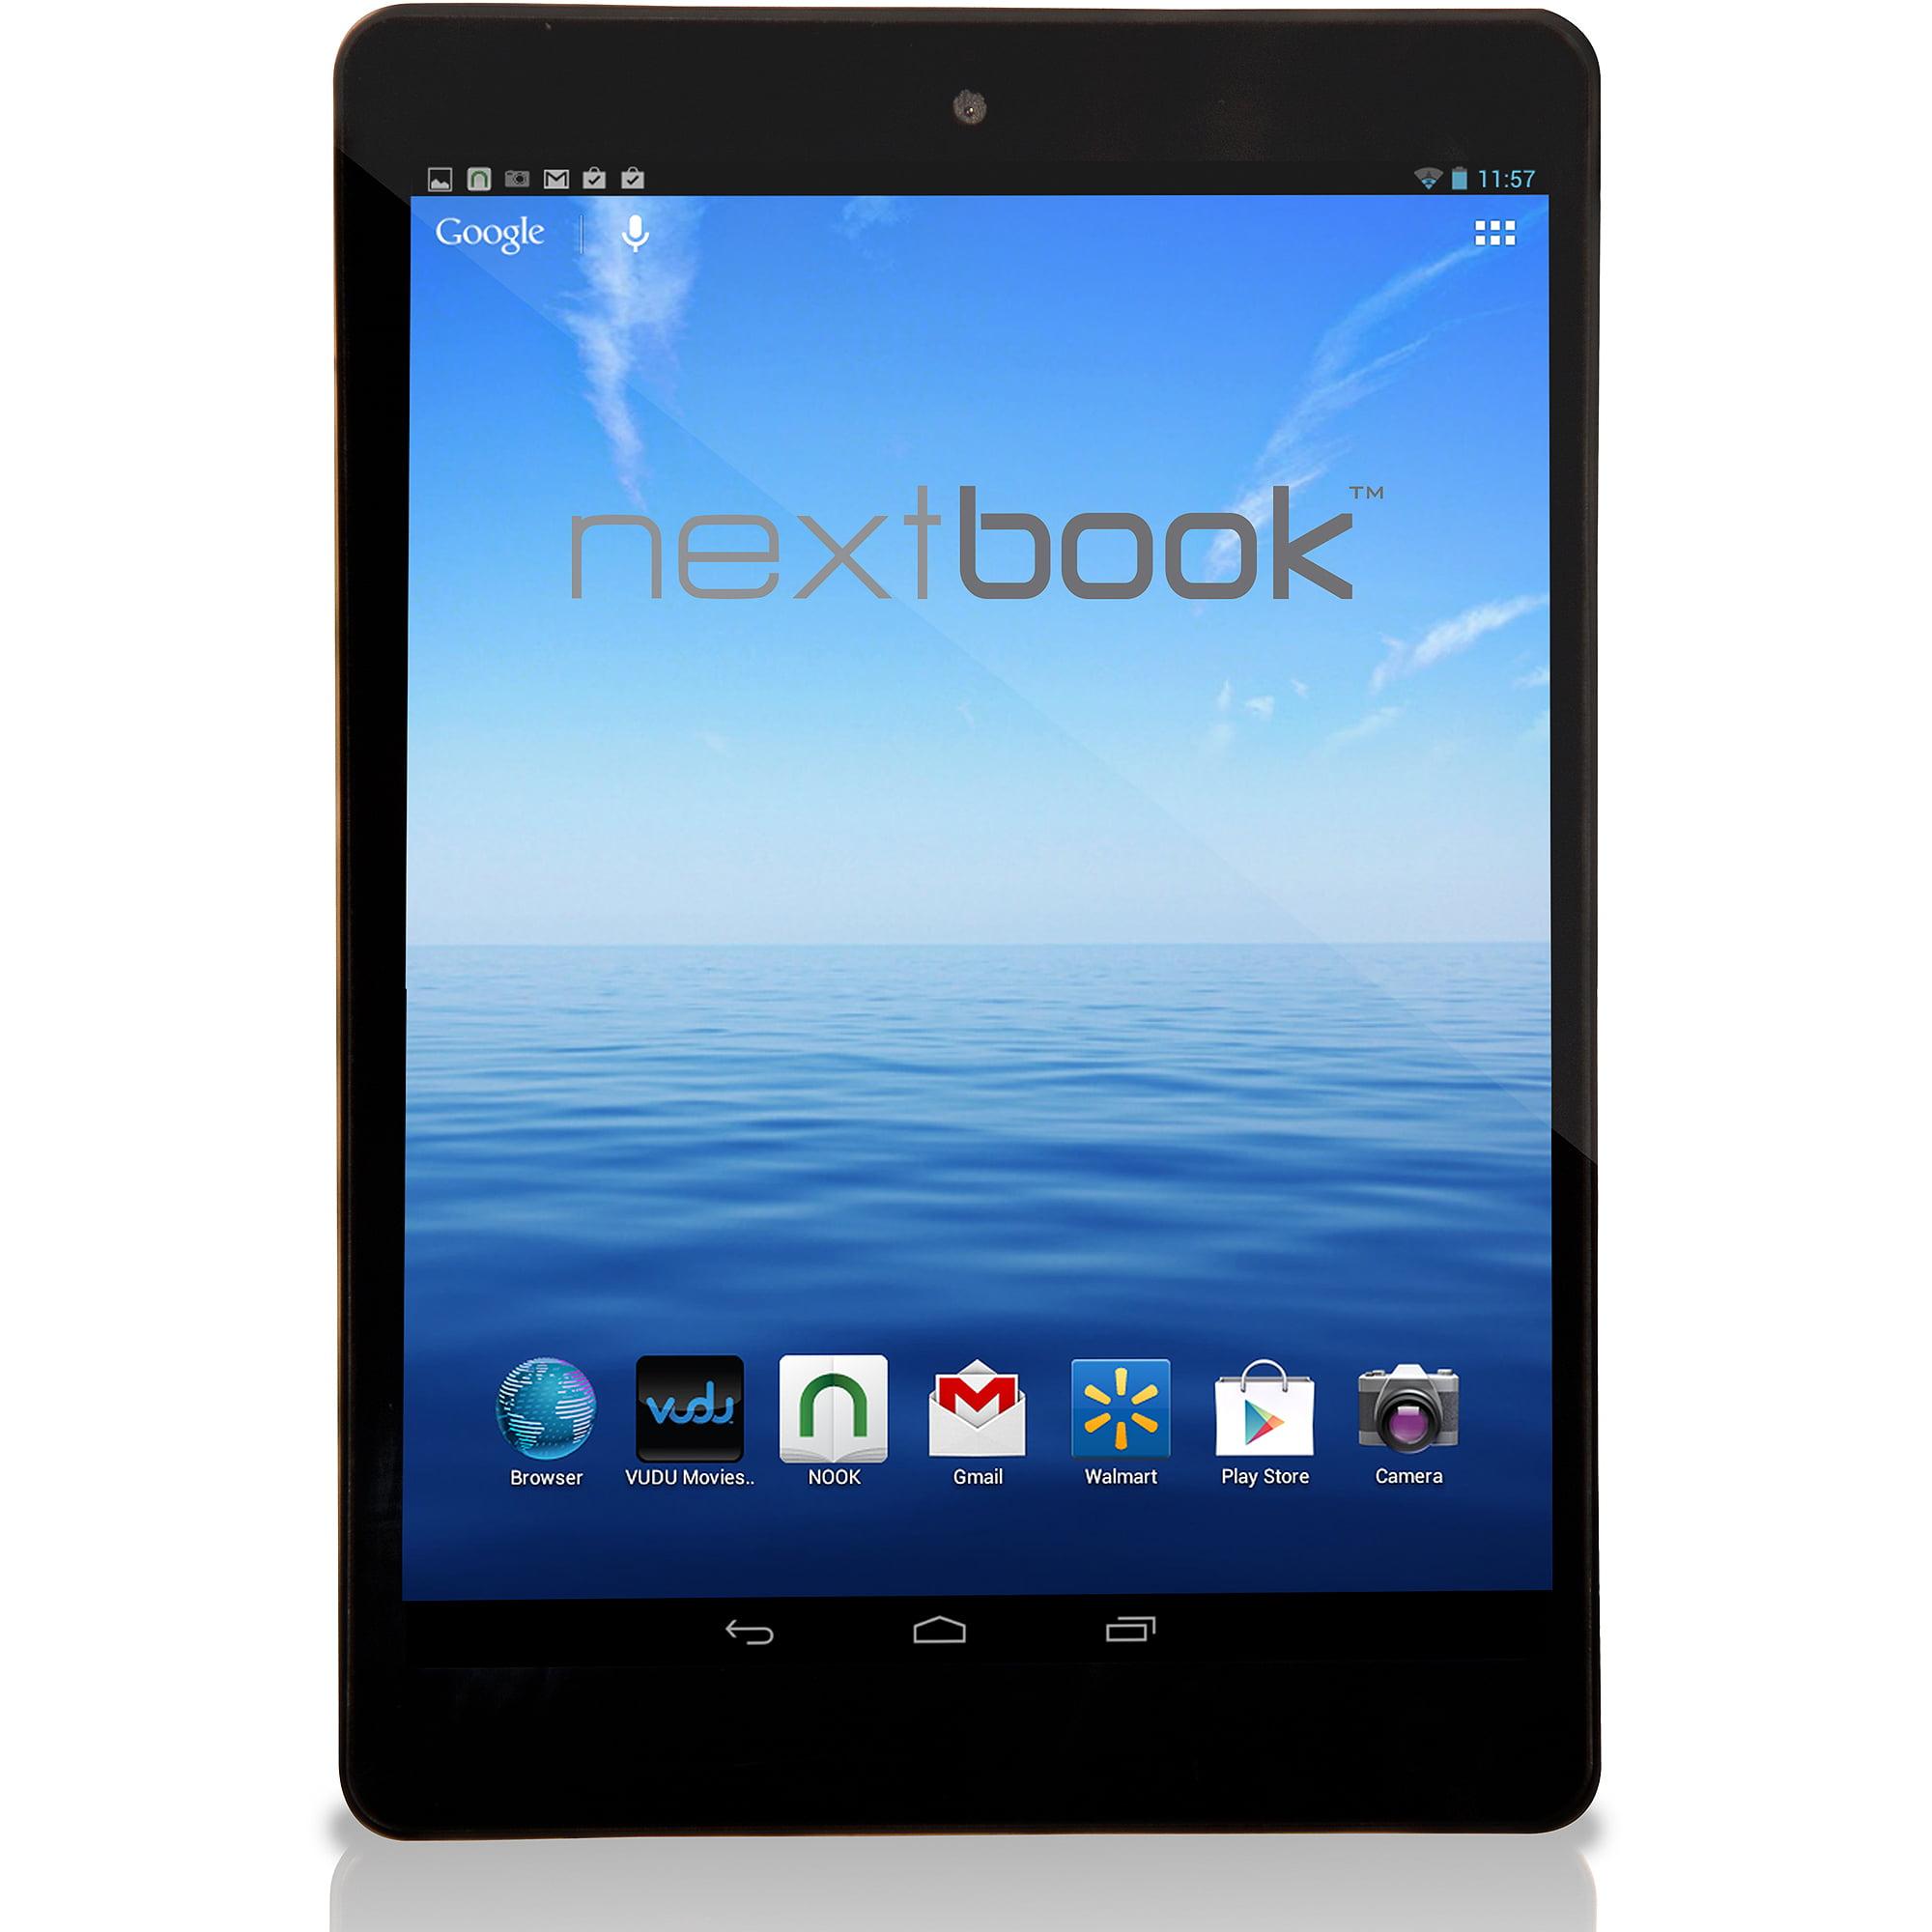 Nextbook NX785QC8G Tablet PC - ARM Cortex A9 RK3188 1.6 GHz Quad-core Processor - 1 GB DDR3 RAM - 8 GB Storage - 8.0-inch Display - Android 4.2 Jelly Bean - Wi-Fi - Black